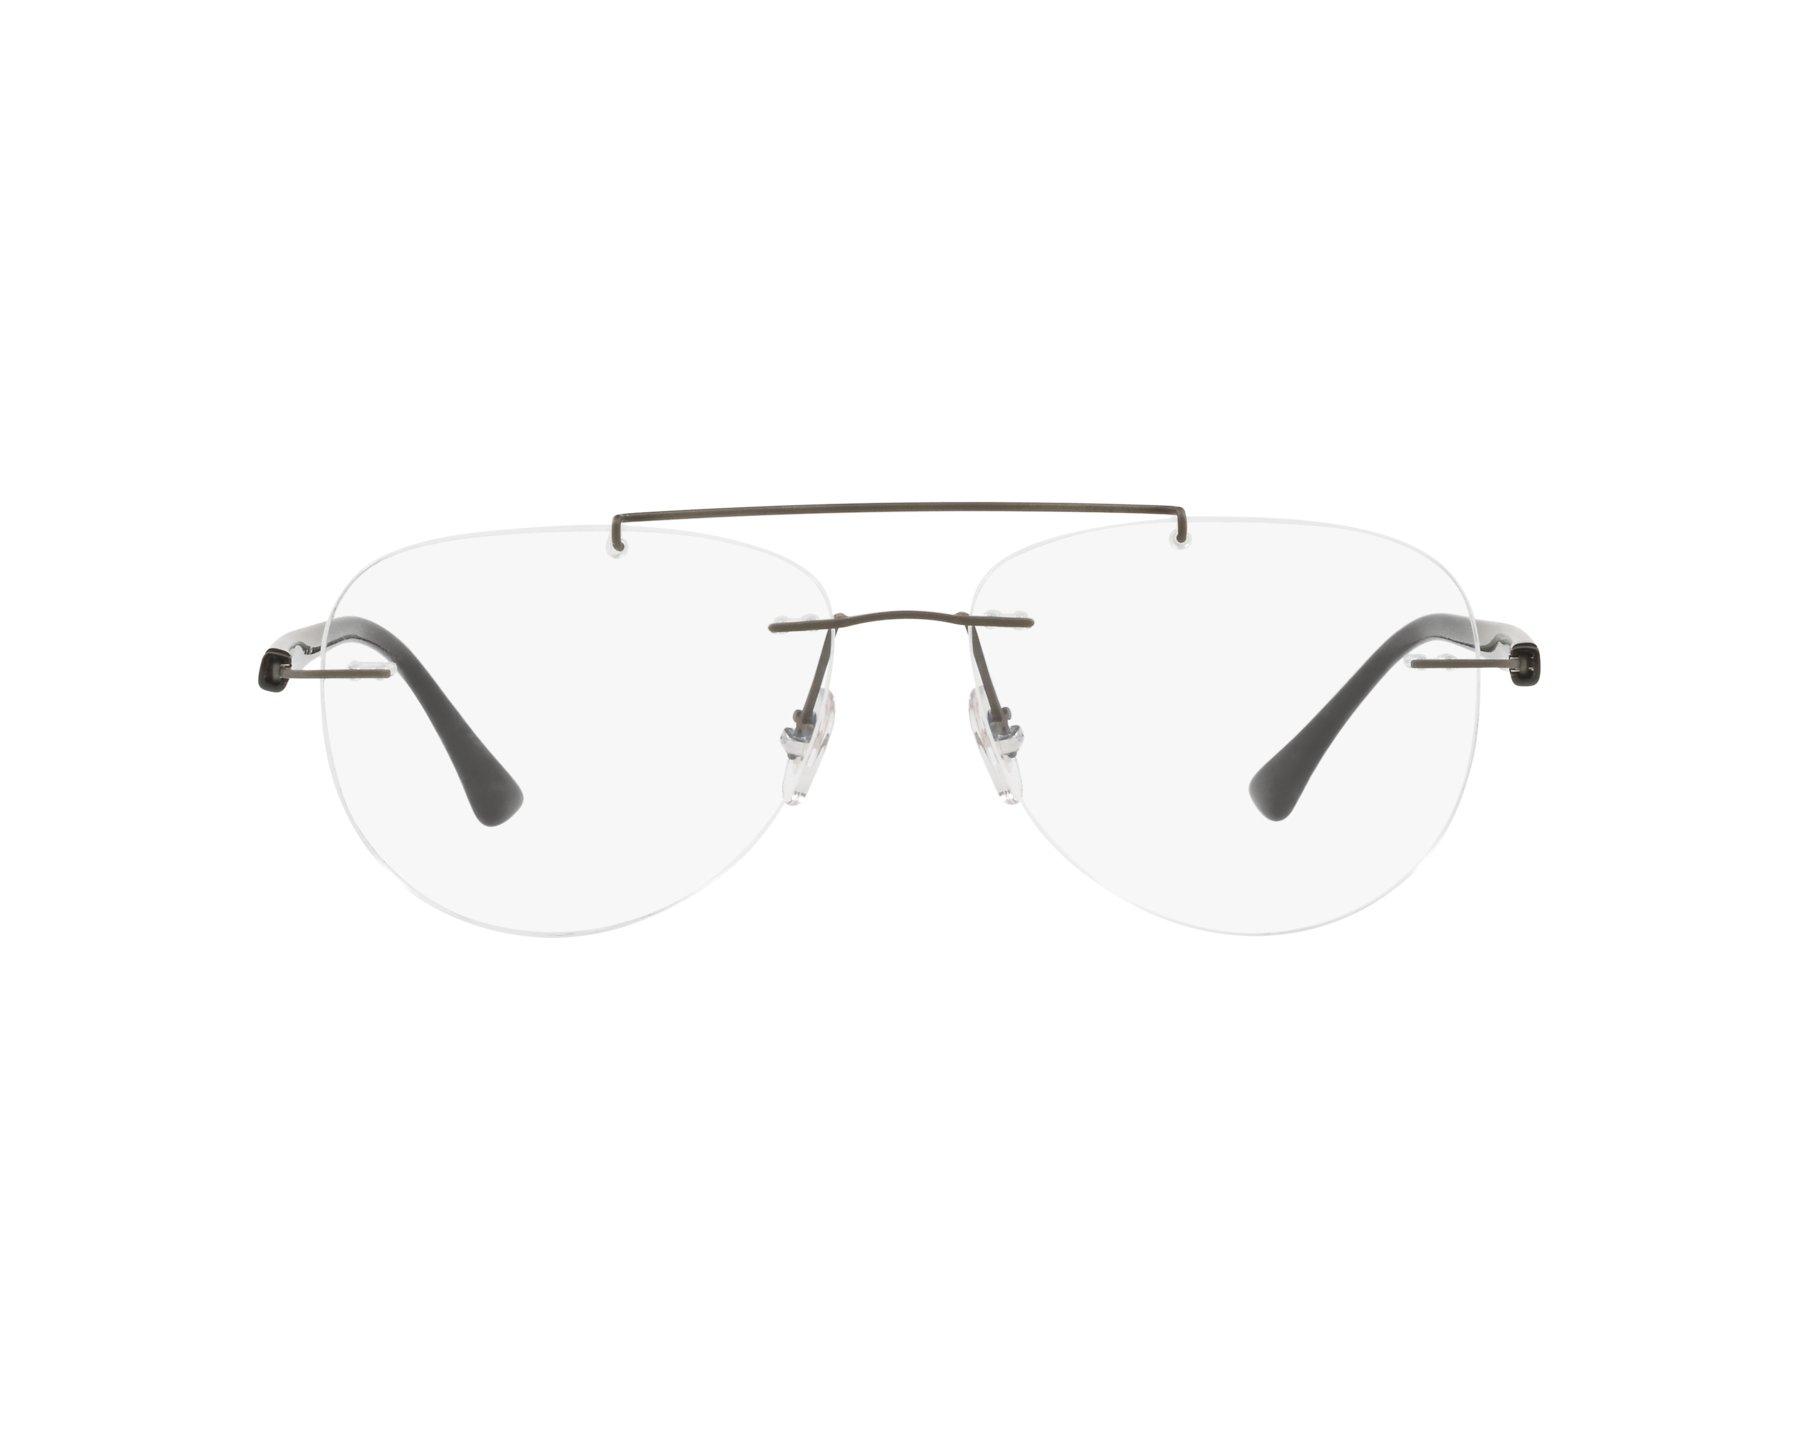 0d8dd508cc66 eyeglasses Ray-Ban RX-8749 1128 54-14 Grey Black 360 degree view